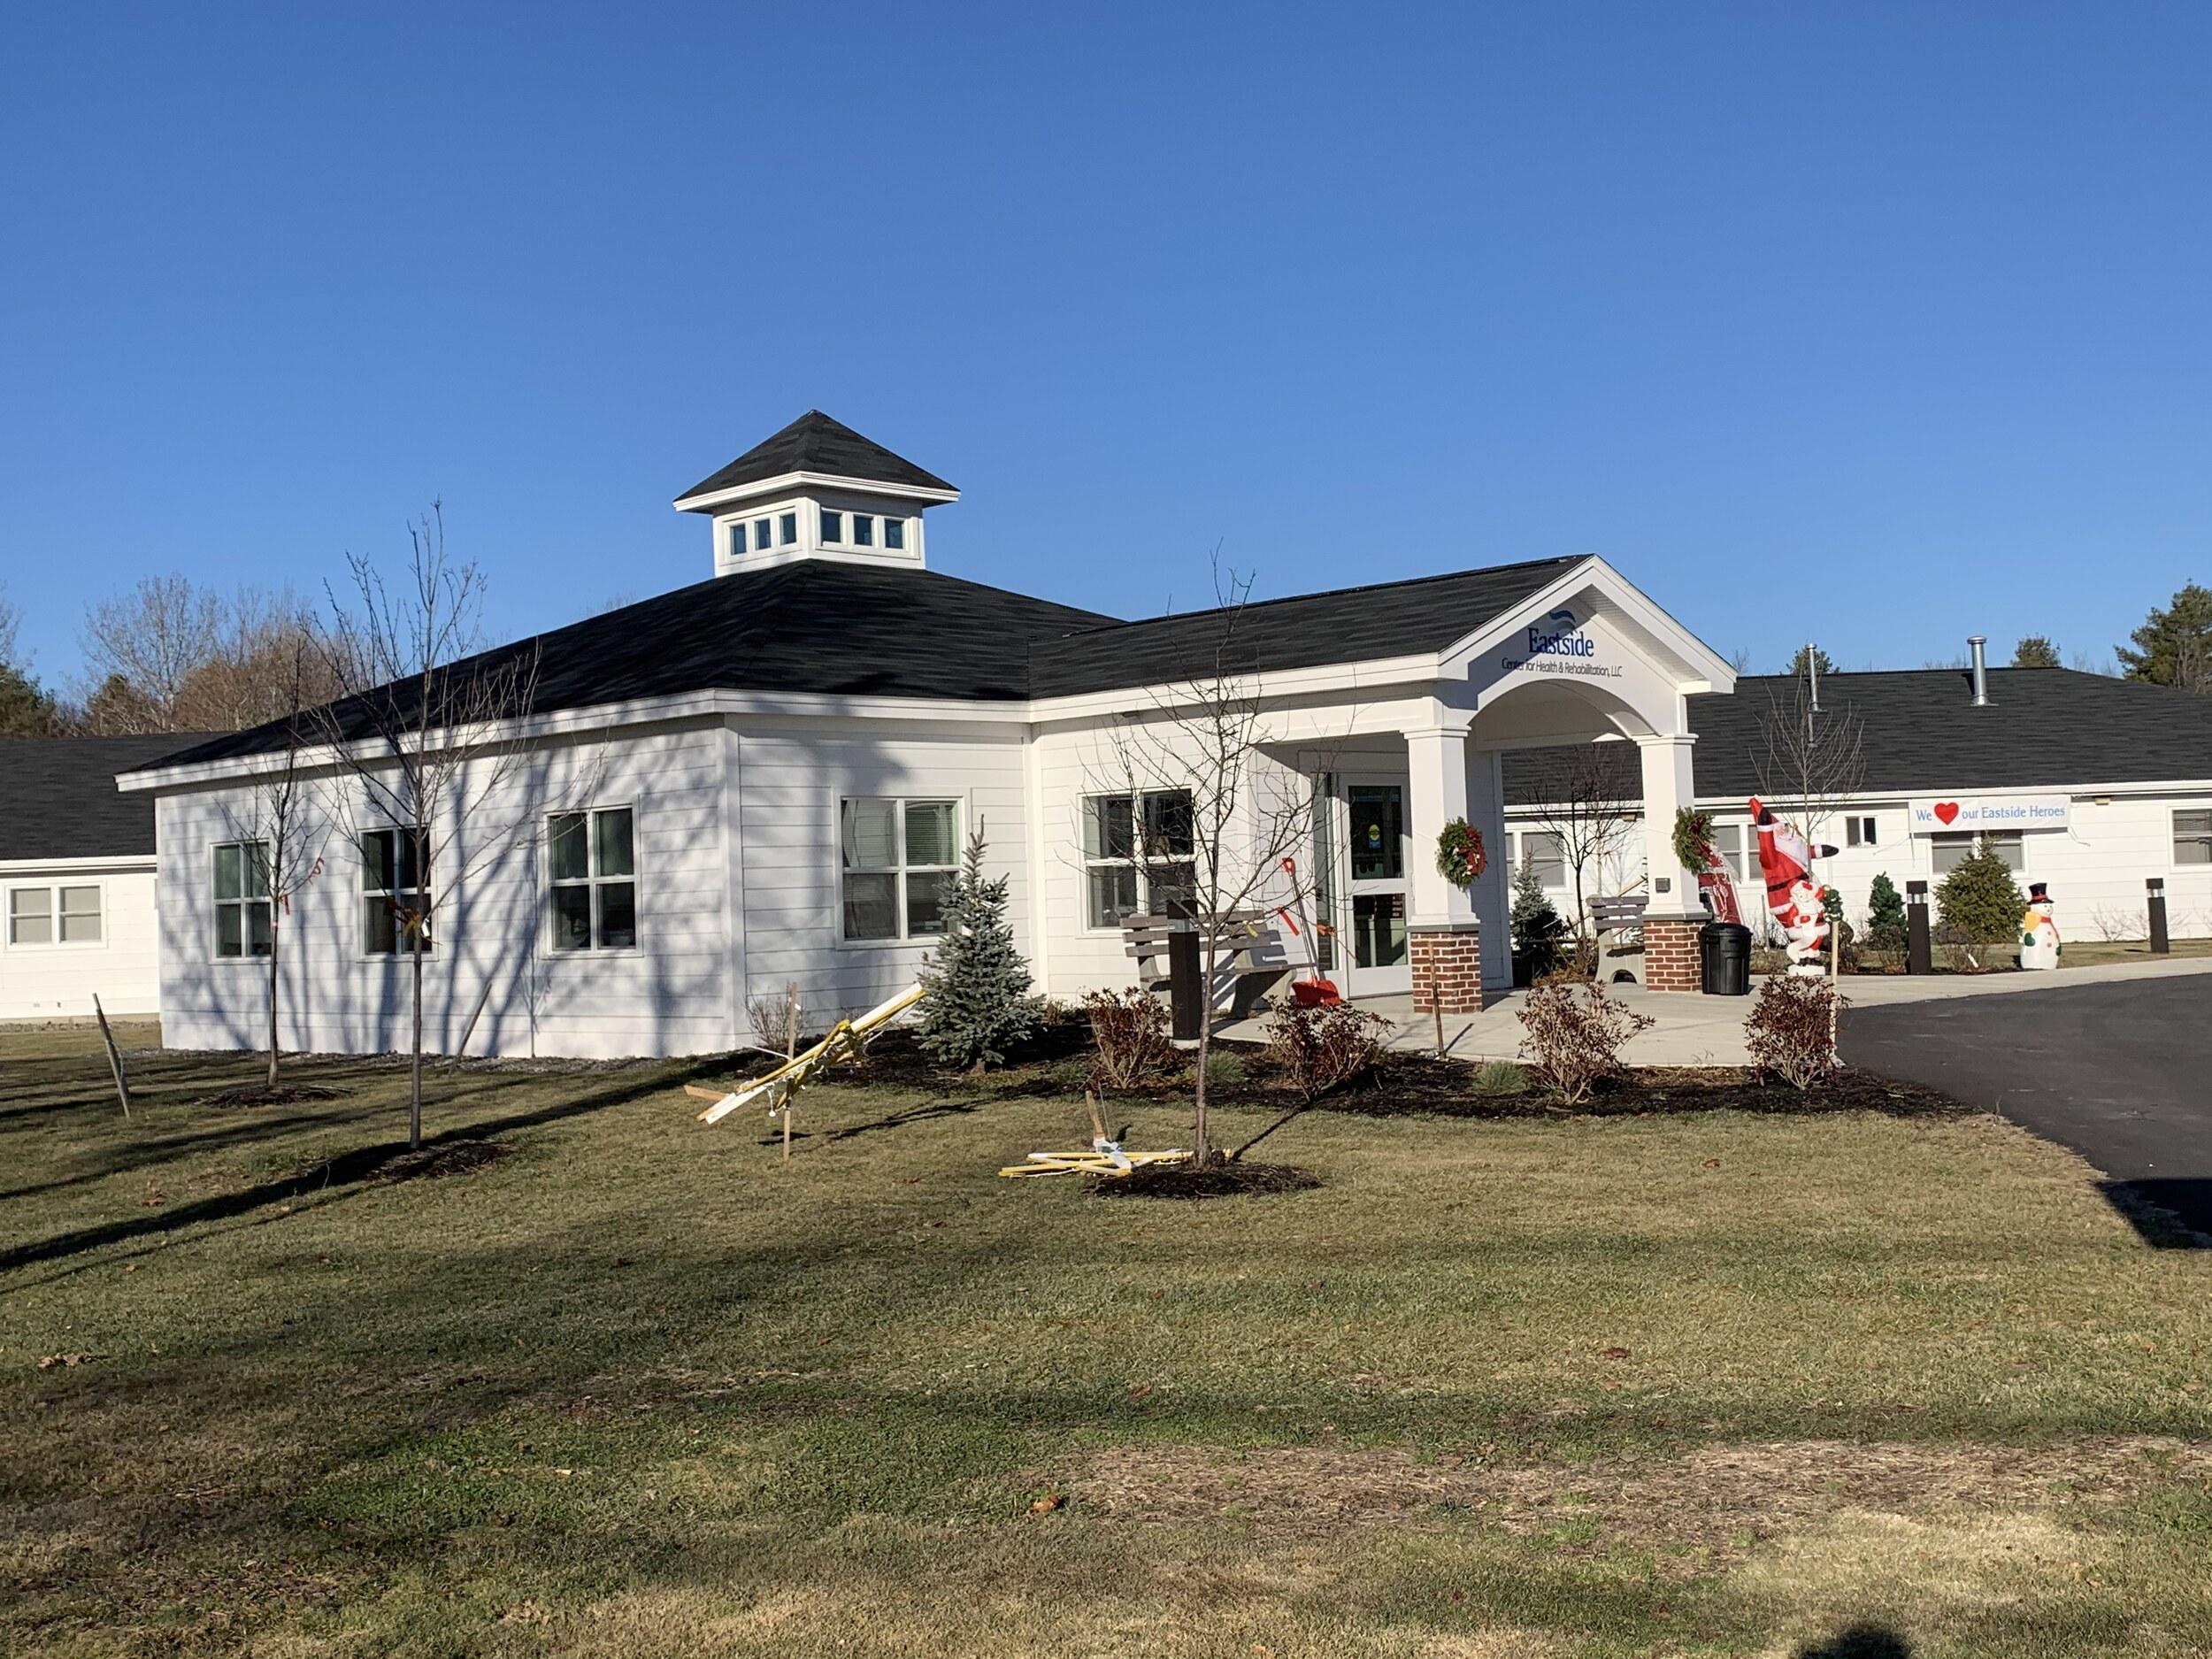 COVID-19 outbreak at Bangor nursing home under investigation